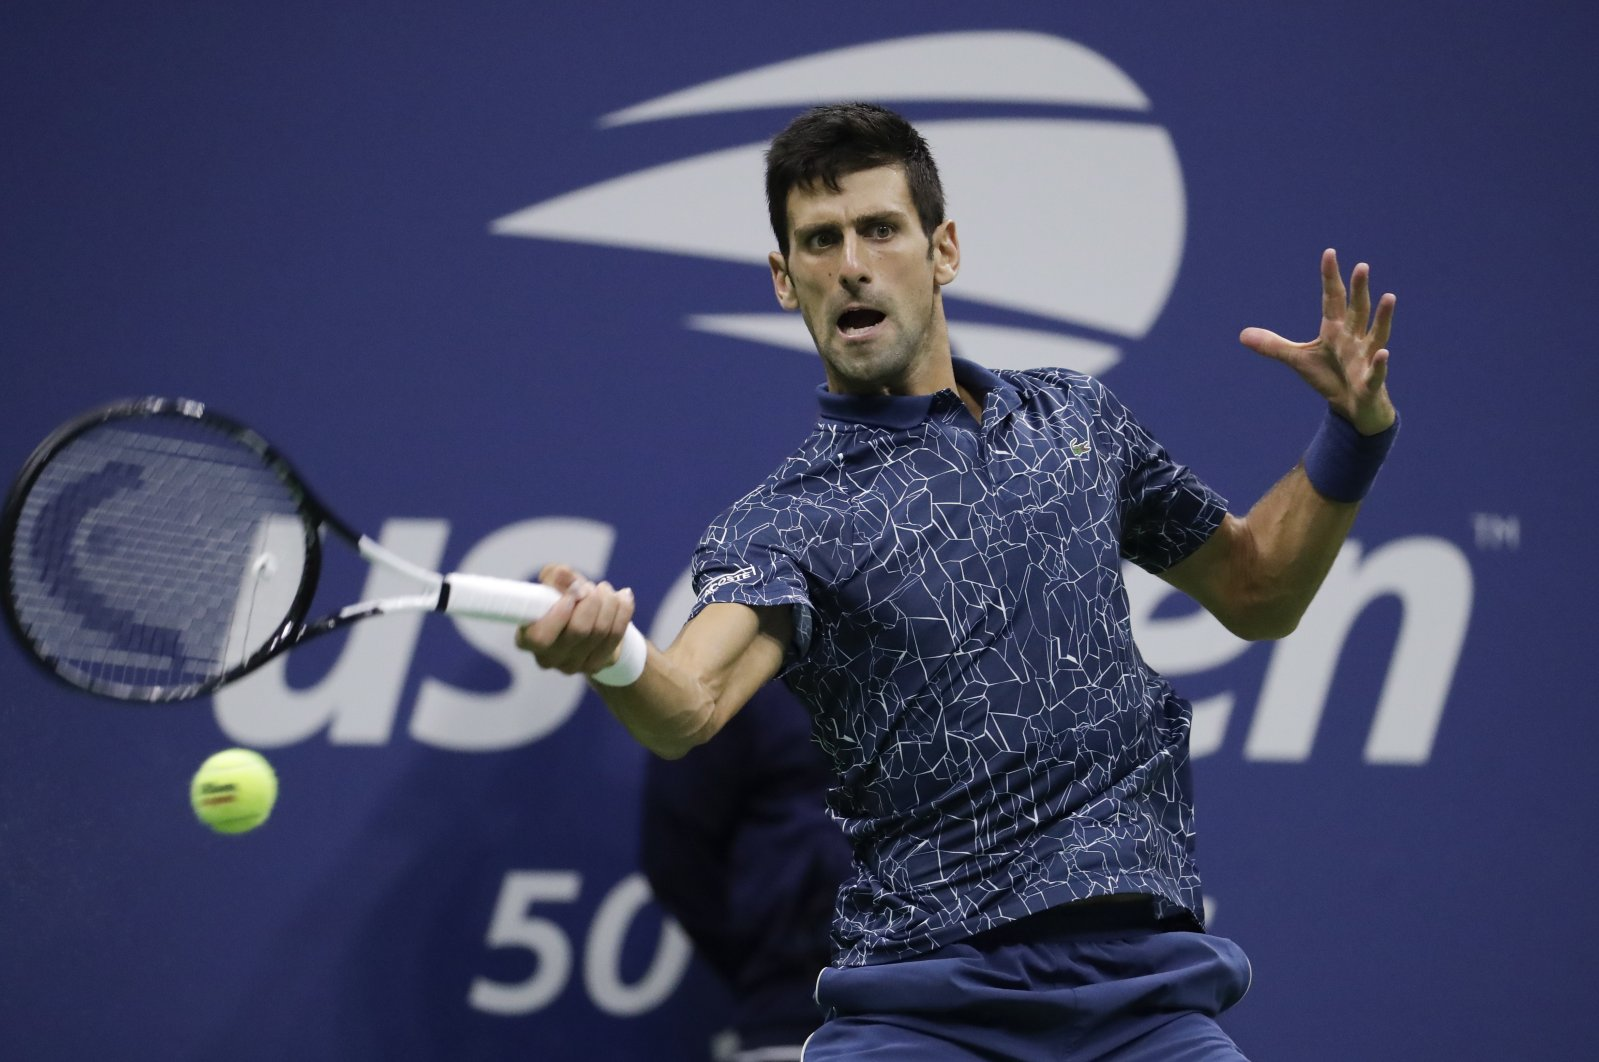 Novak Djokovic in action during the U.S. Open tennis tournament final in New York, U.S., Sept. 9, 2018. (AP Photo)